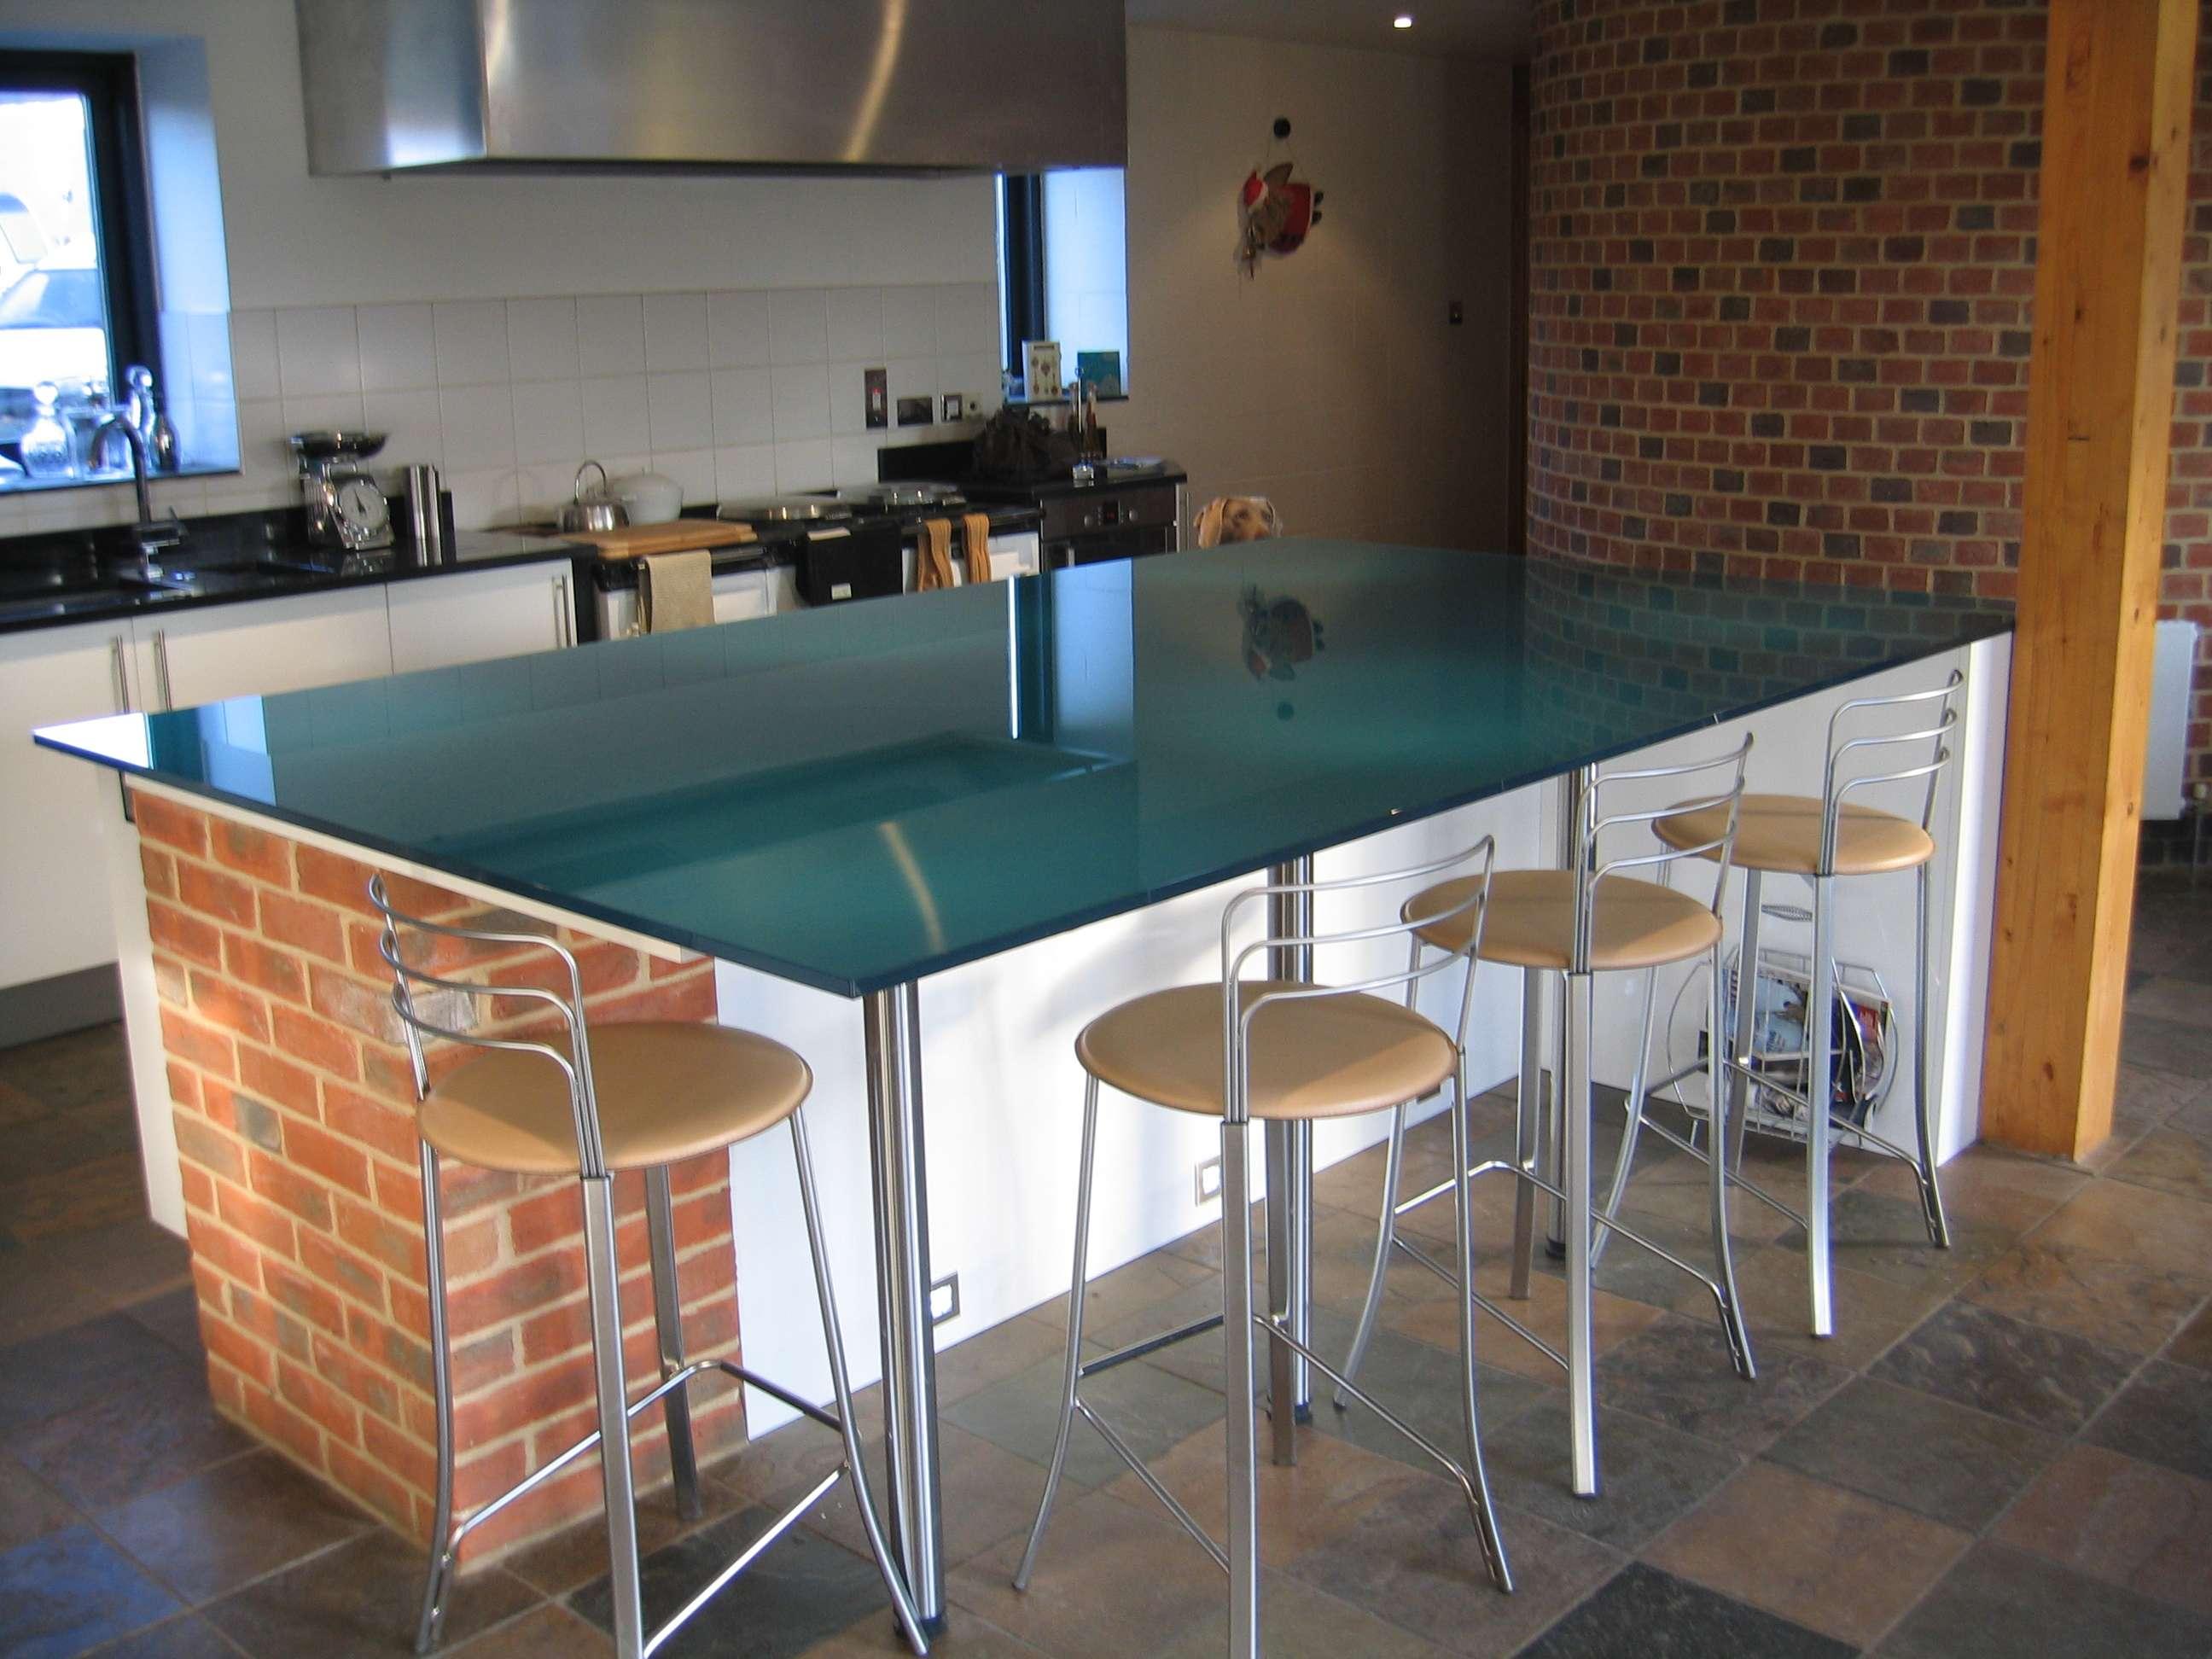 metallic-blå-glas-køkken-bordplade-and-breakfast-bar